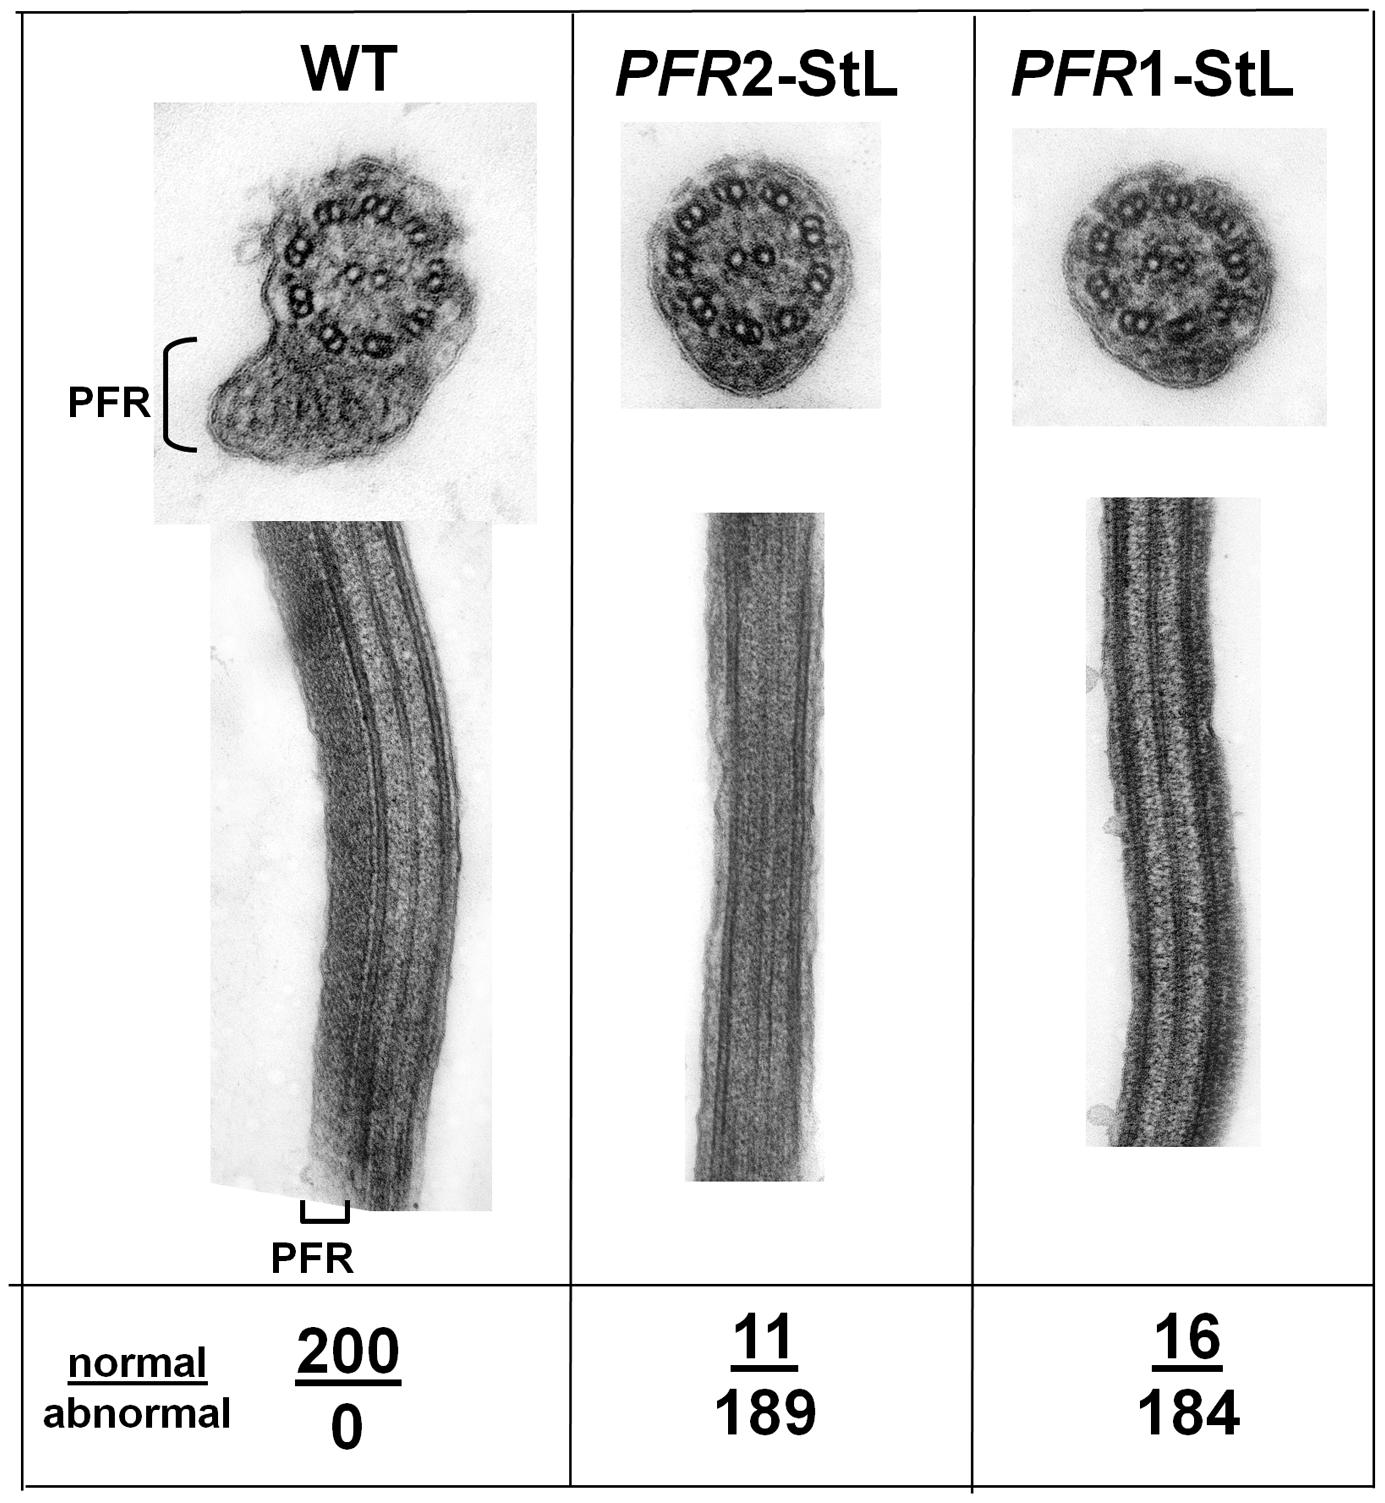 Ablation of paraflagellar rod synthesis following RNAi of <i>PFR1</i> or <i>PFR2</i>.